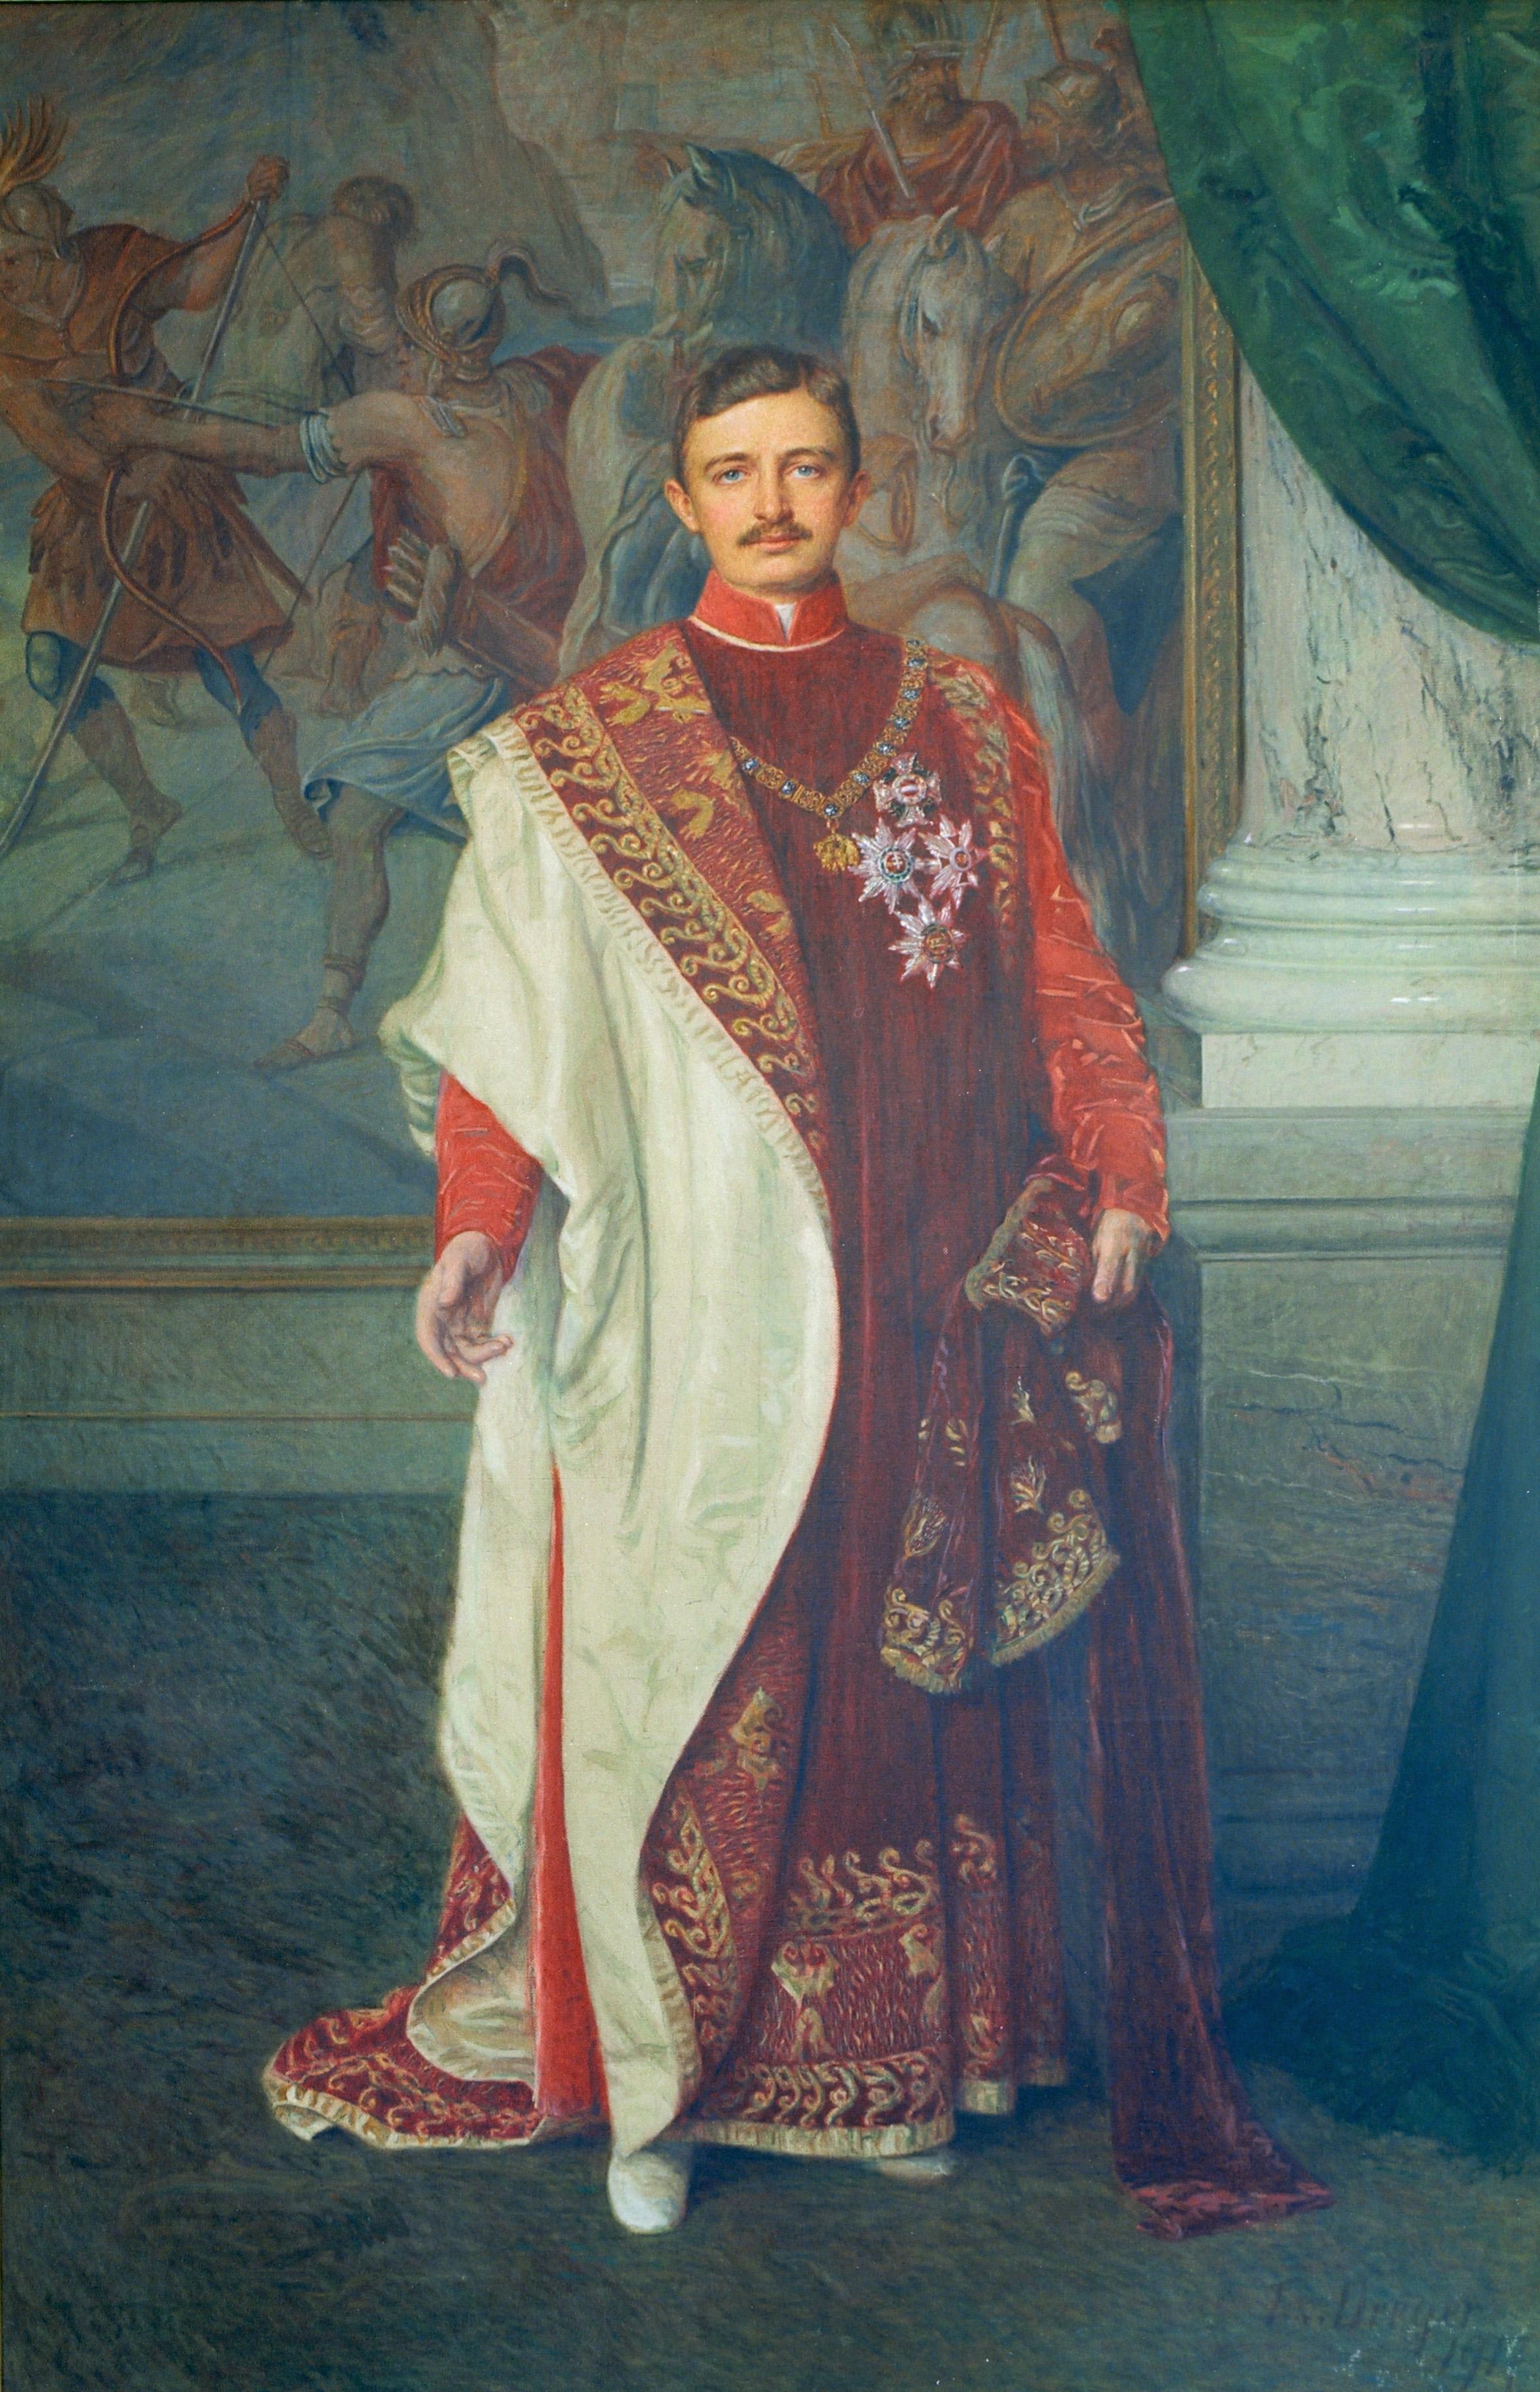 Emperor Karl Beatified in Saint Peter's Square